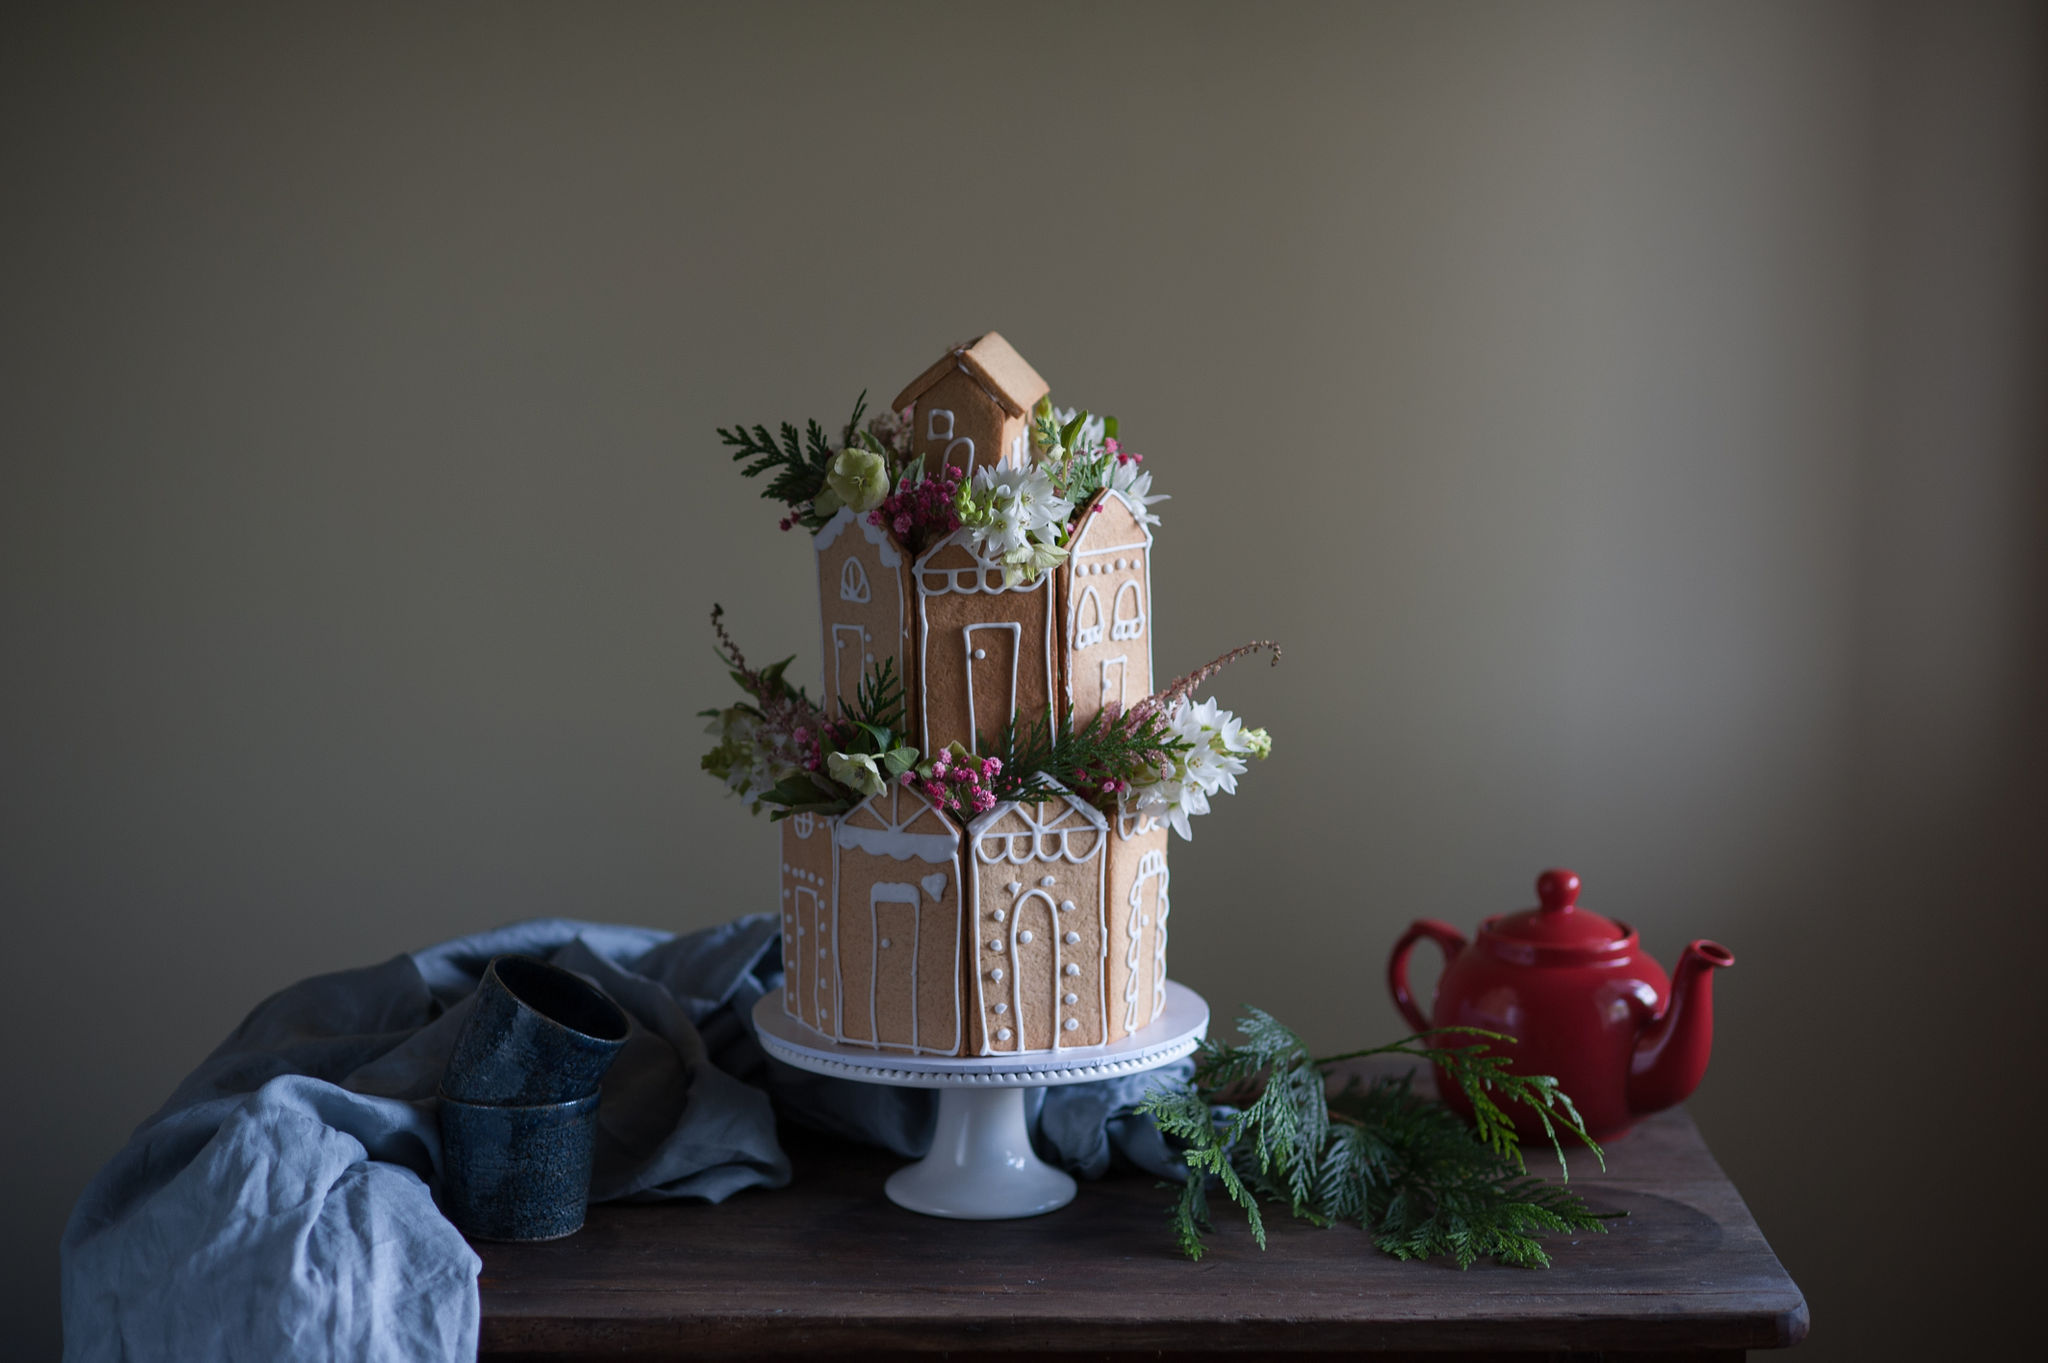 cherry-cakes-shoot-17-002.jpg